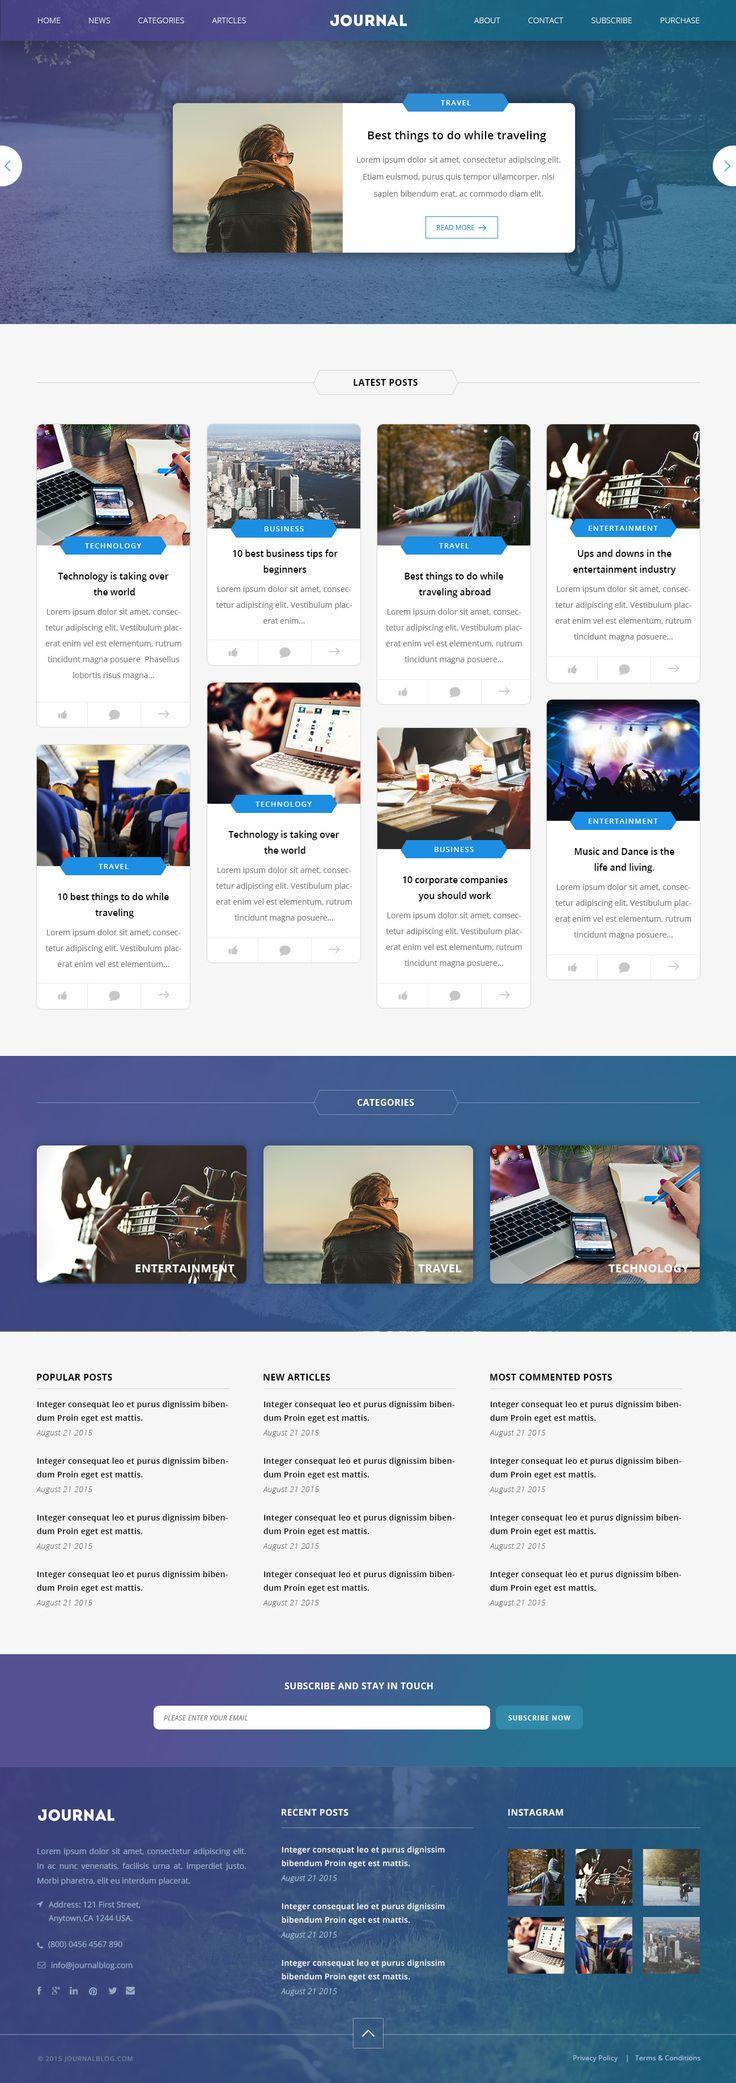 131 best Website Templates images on Pinterest | Website template ...